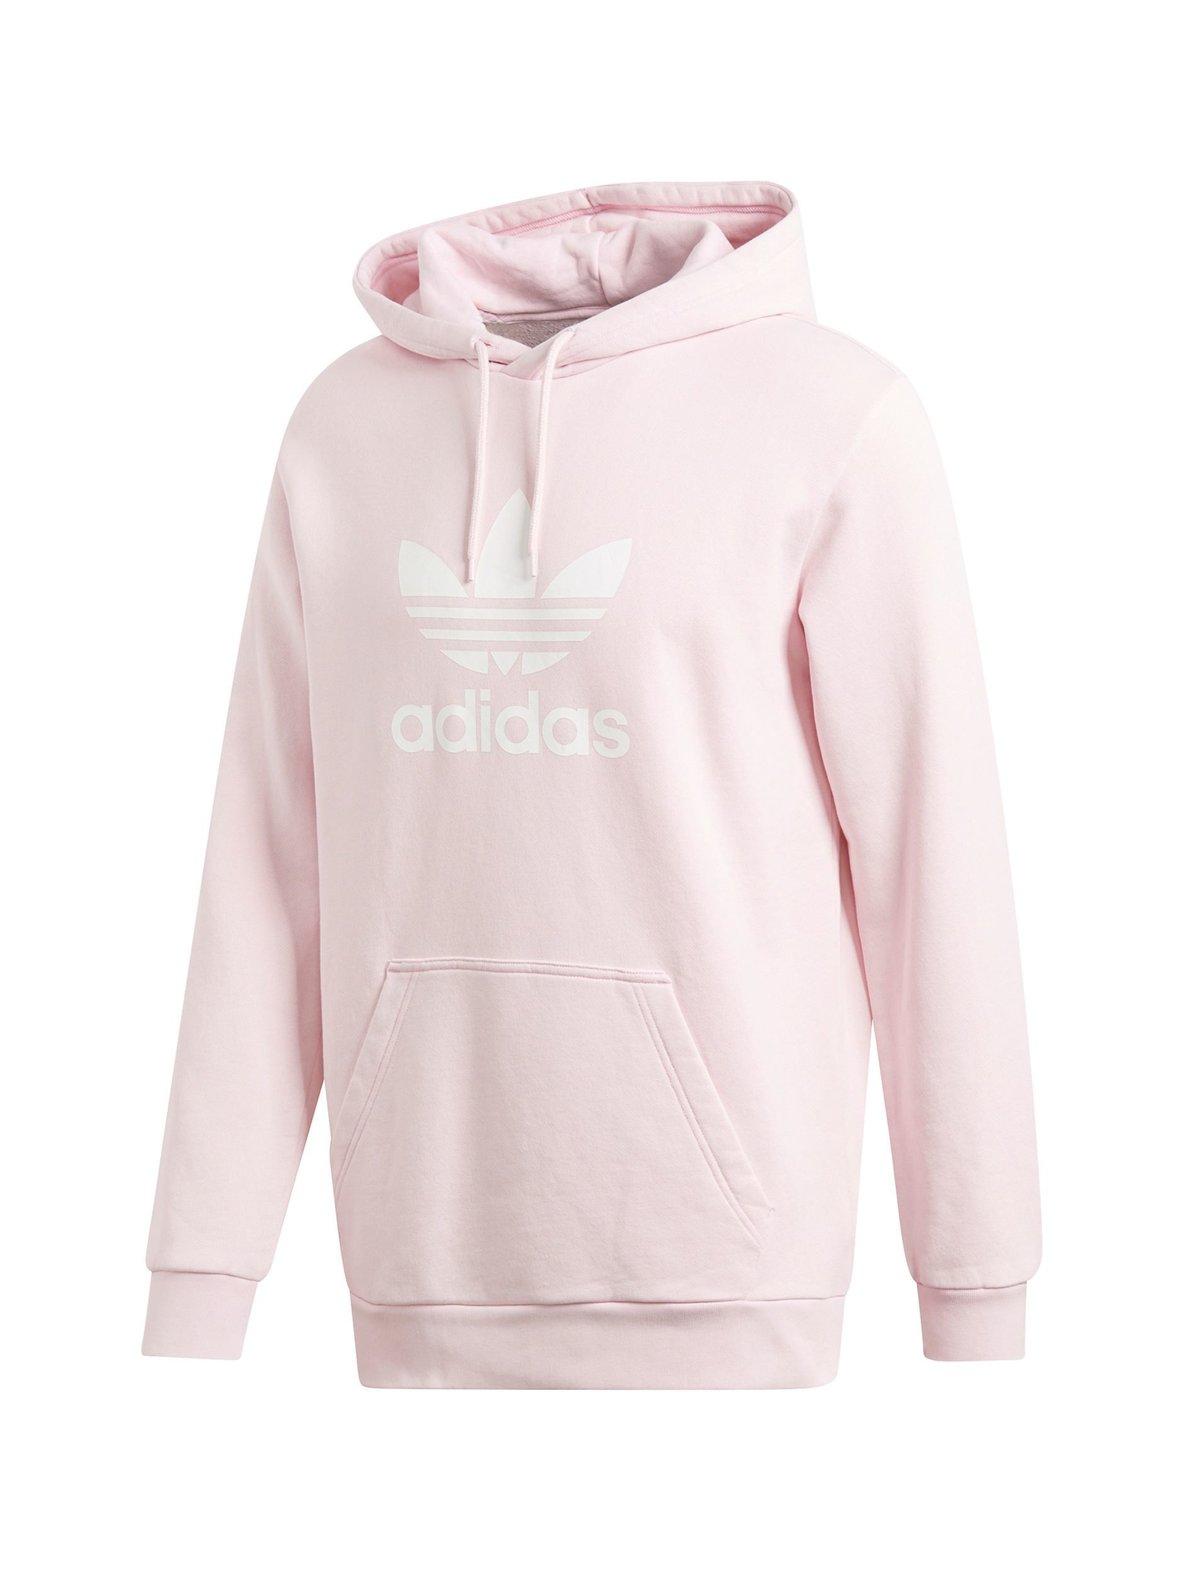 Clear Pink (vaaleanpunainen) Adidas Originals M Trefoil -huppari ... 42c057a8d7